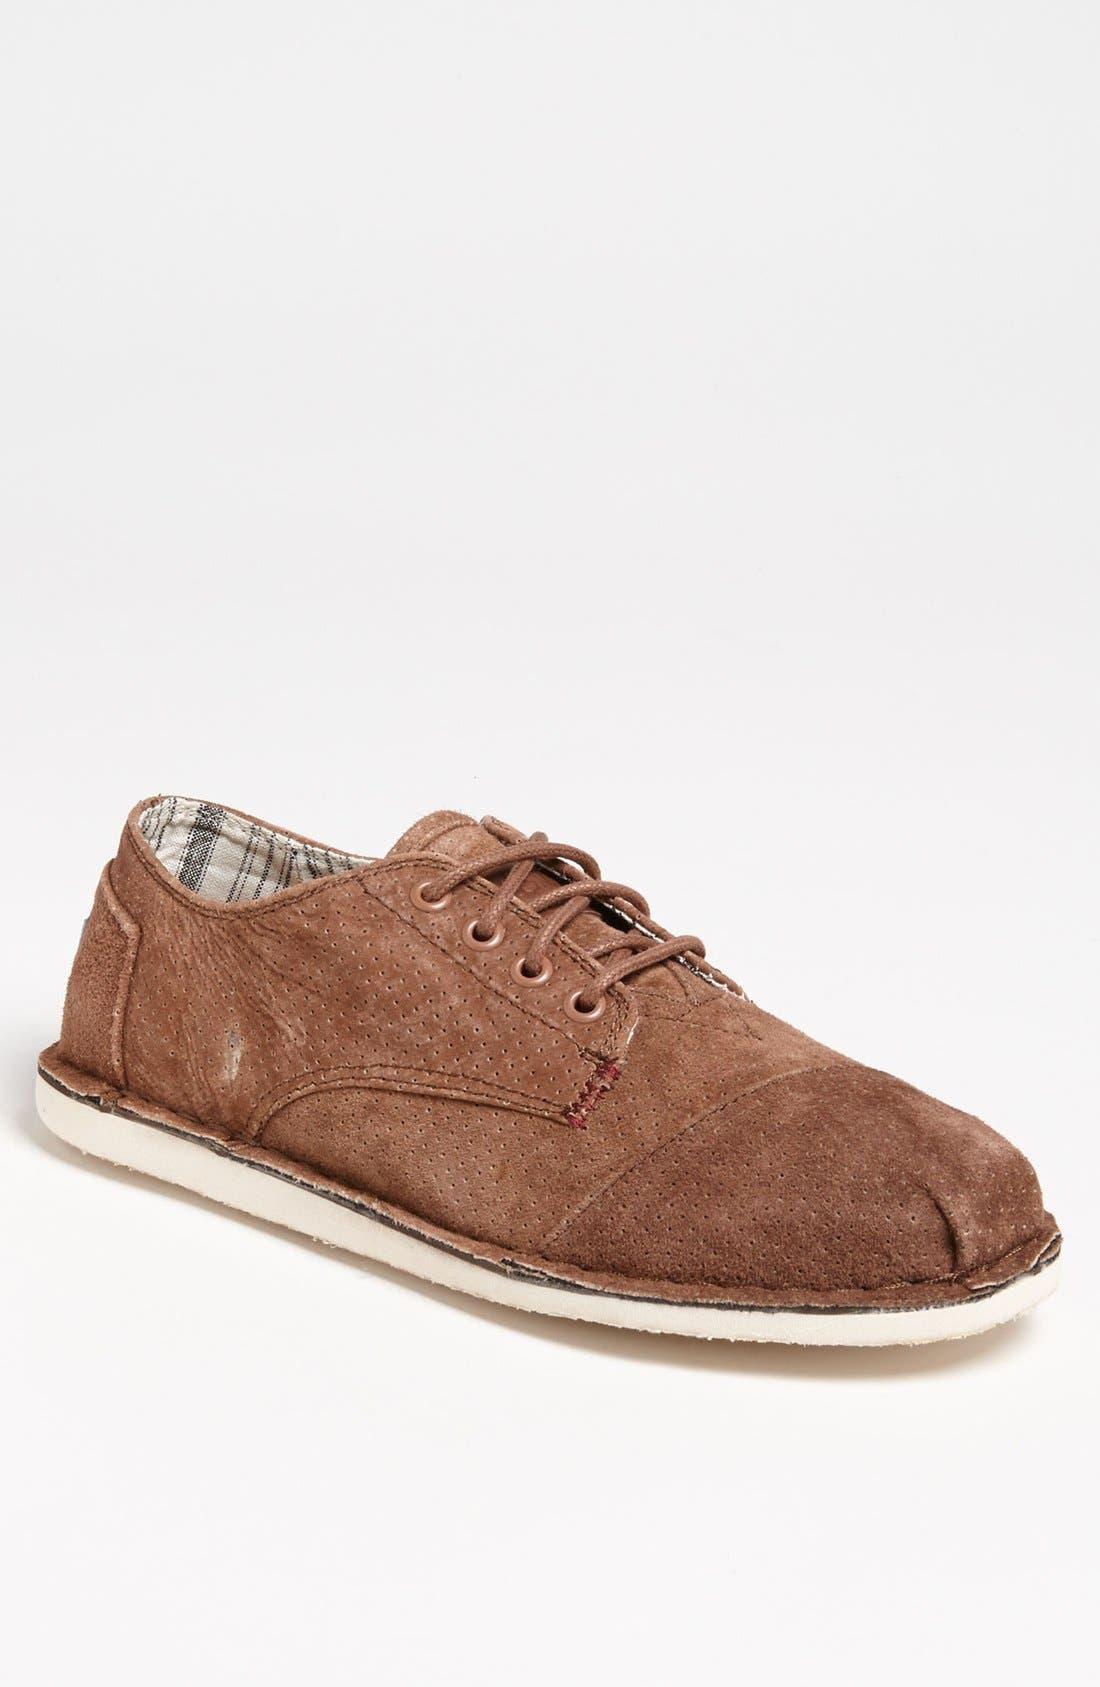 Alternate Image 1 Selected - TOMS 'Desert' Perforated Suede Sneaker (Men)